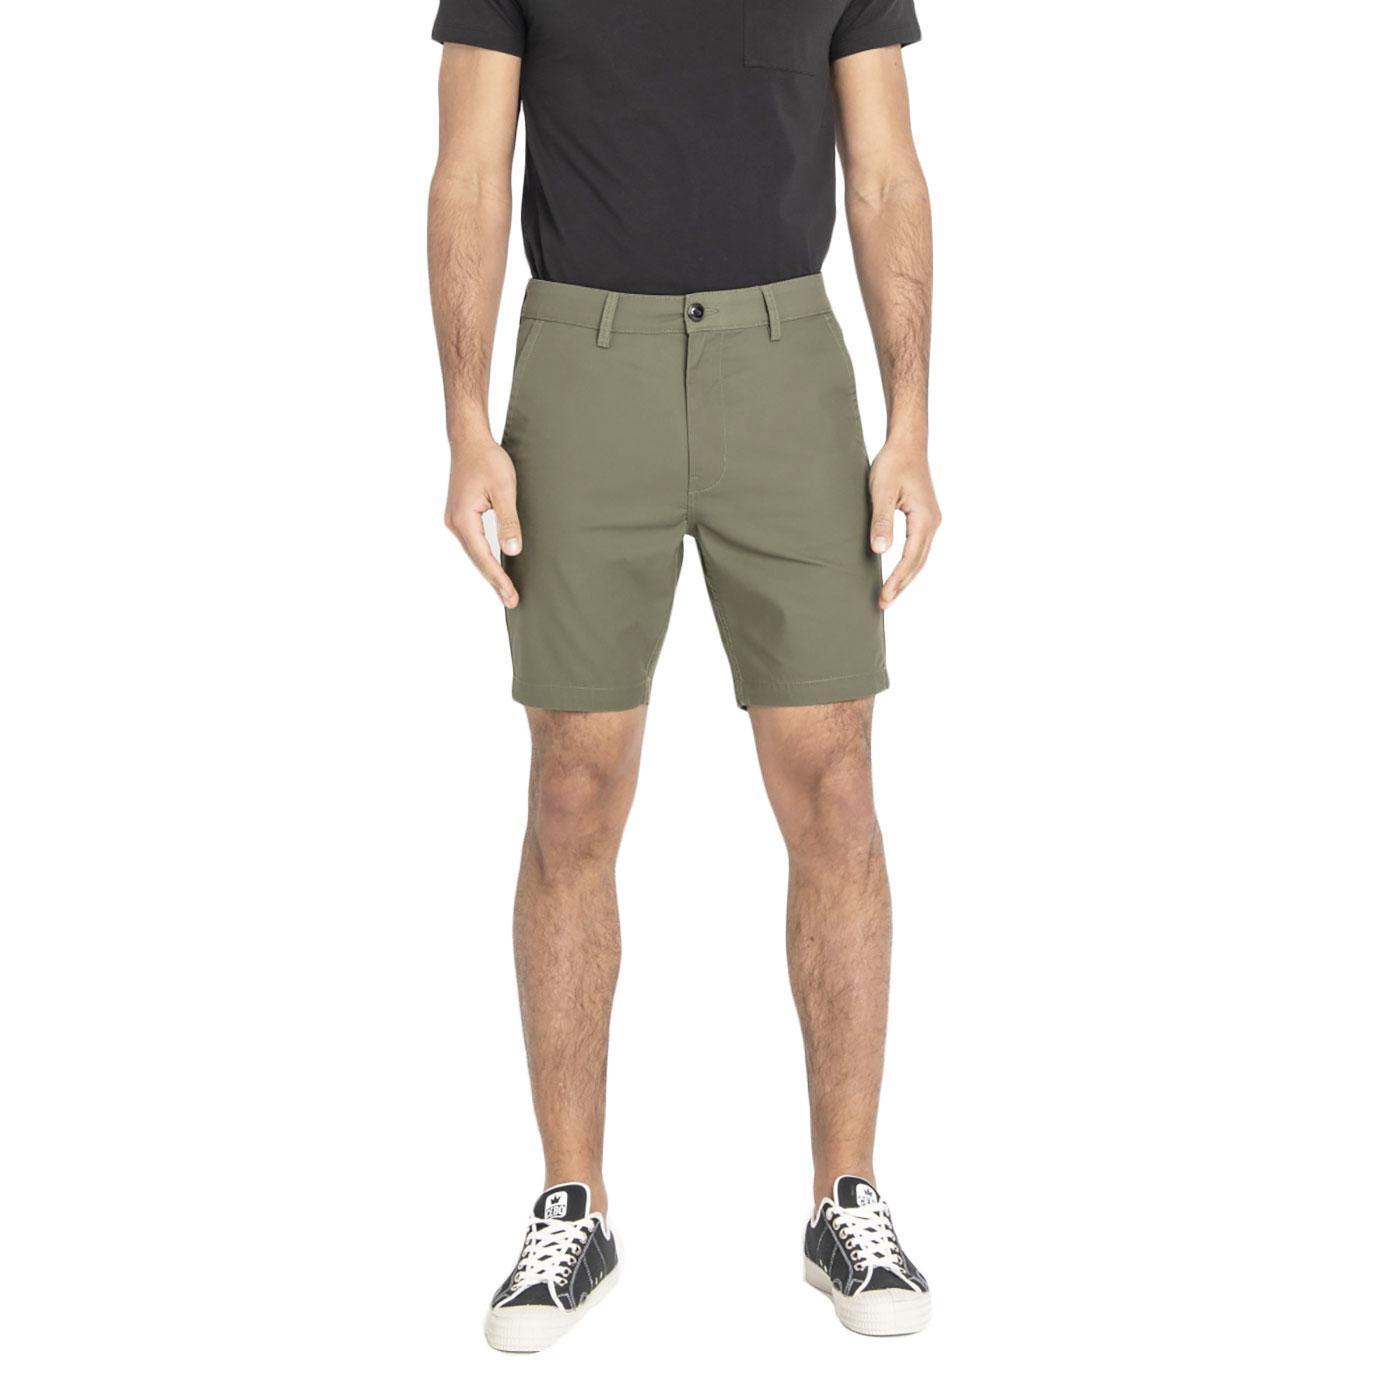 LEE Men's Retro Slim Chino Shorts (Ivy Green)